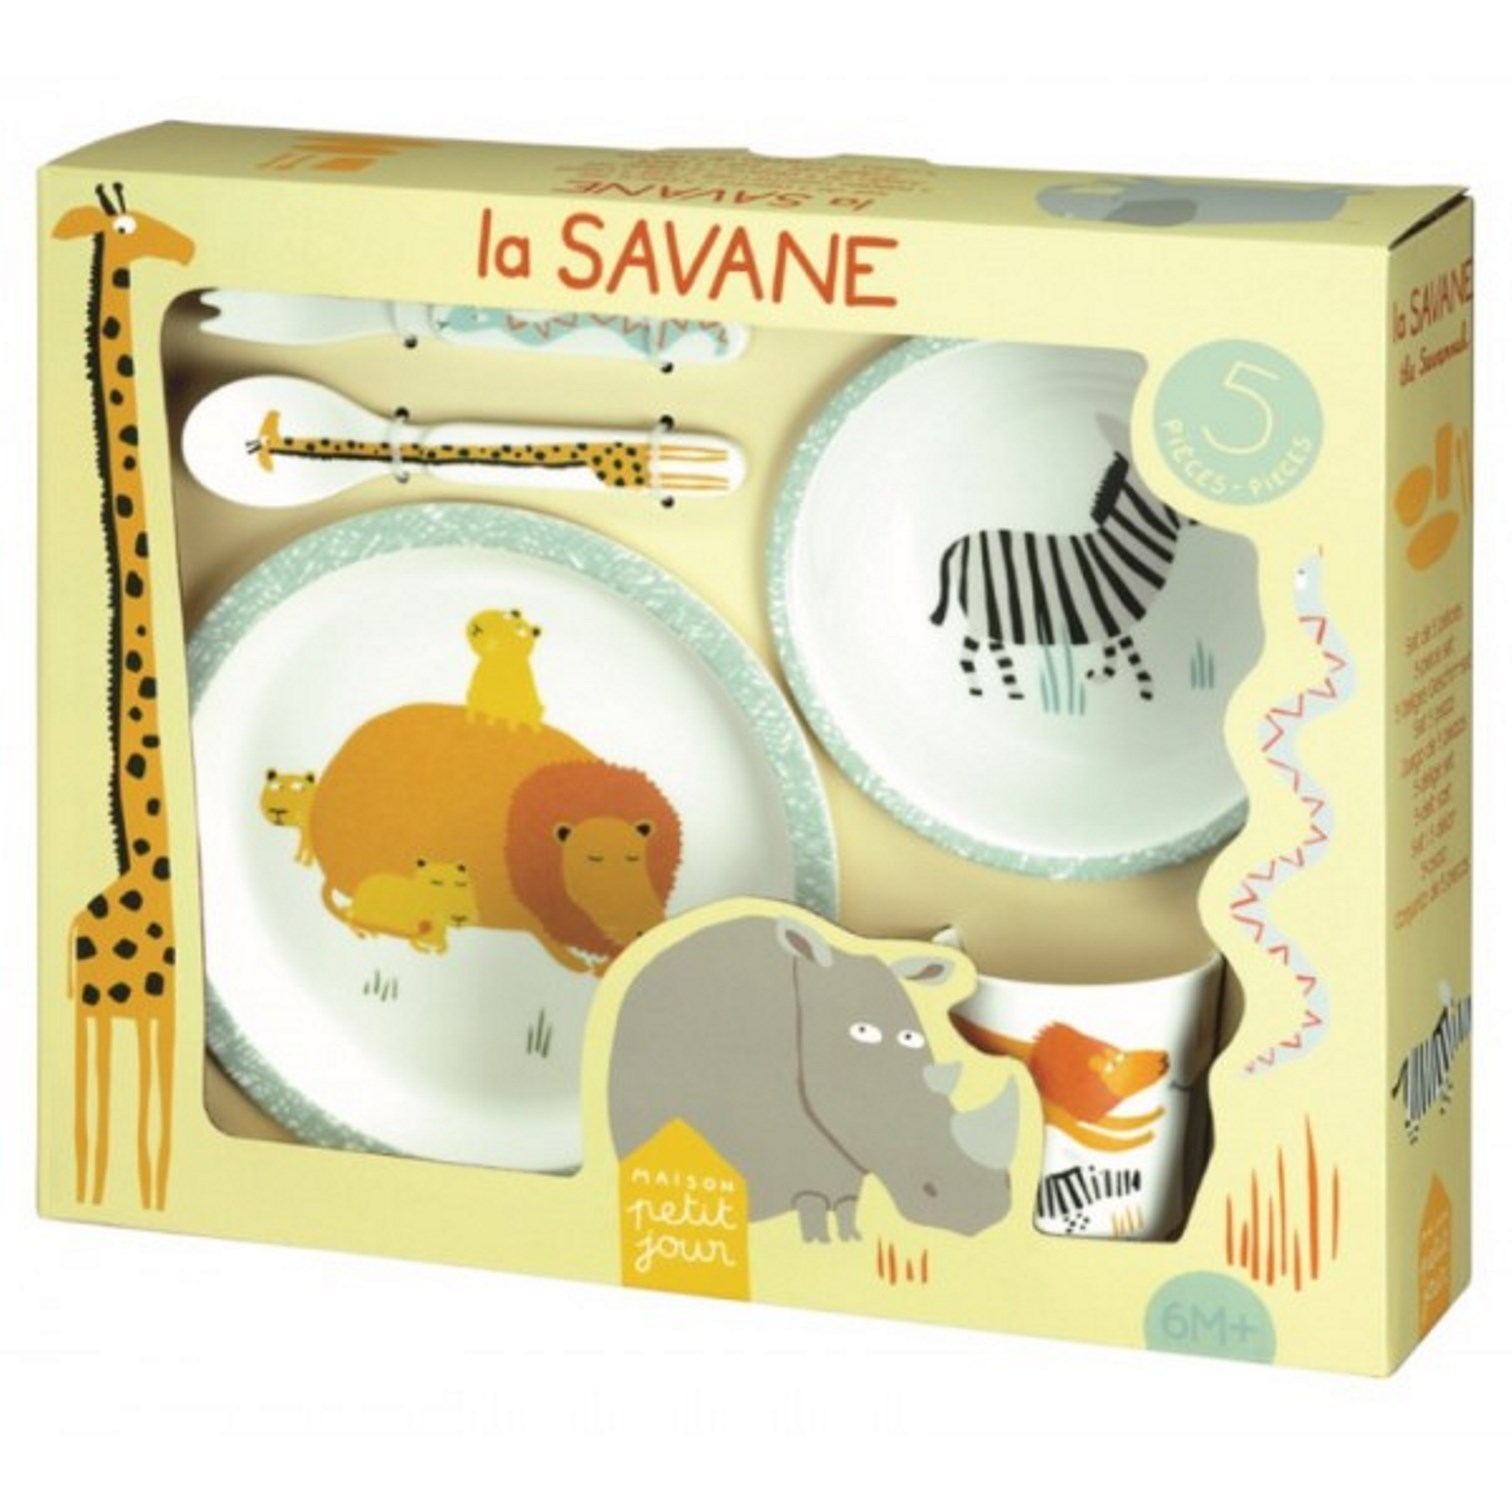 "Онлайн каталог PROMENU: Набор детский ""Животные"" (тарелка, пиала, стакан, ложка, вилка) Maison Petit Jour SAVANNAH, 33,5x27x7 см, белый, 5 предметов                               SA701N"